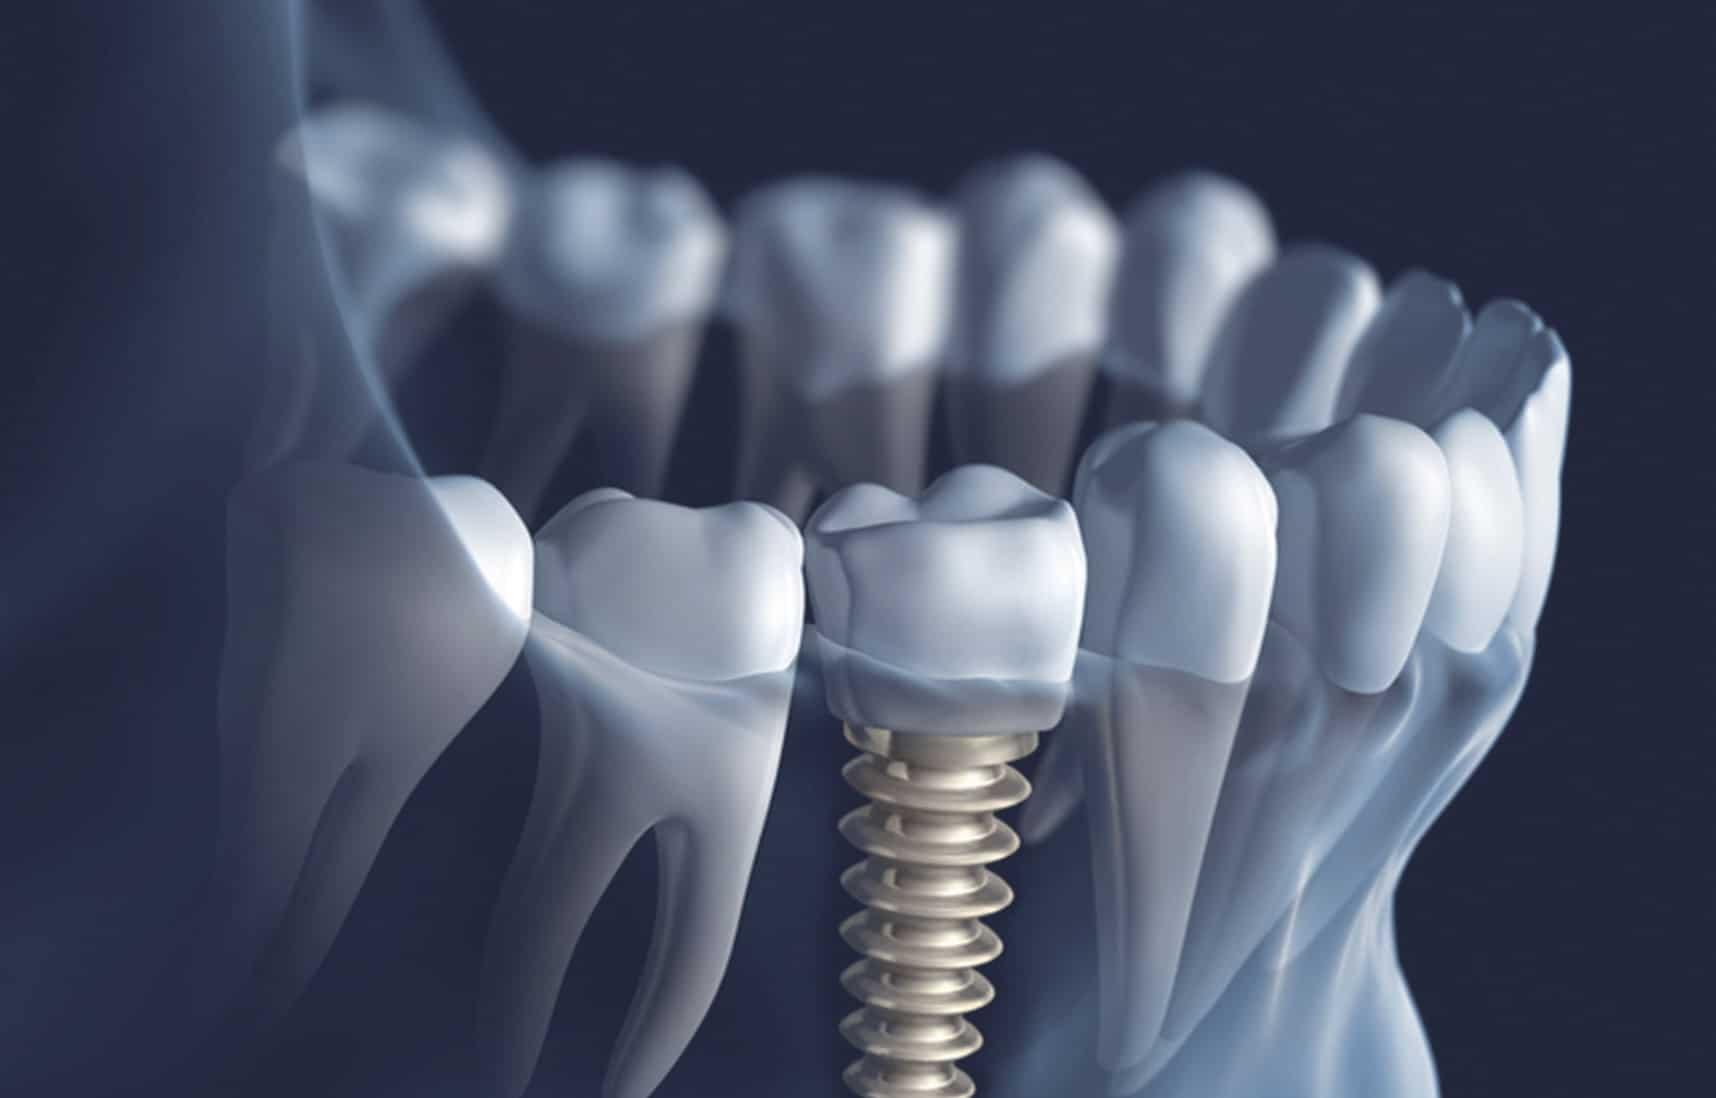 Dentus perfectus - implantologija - što su zubni implantati?